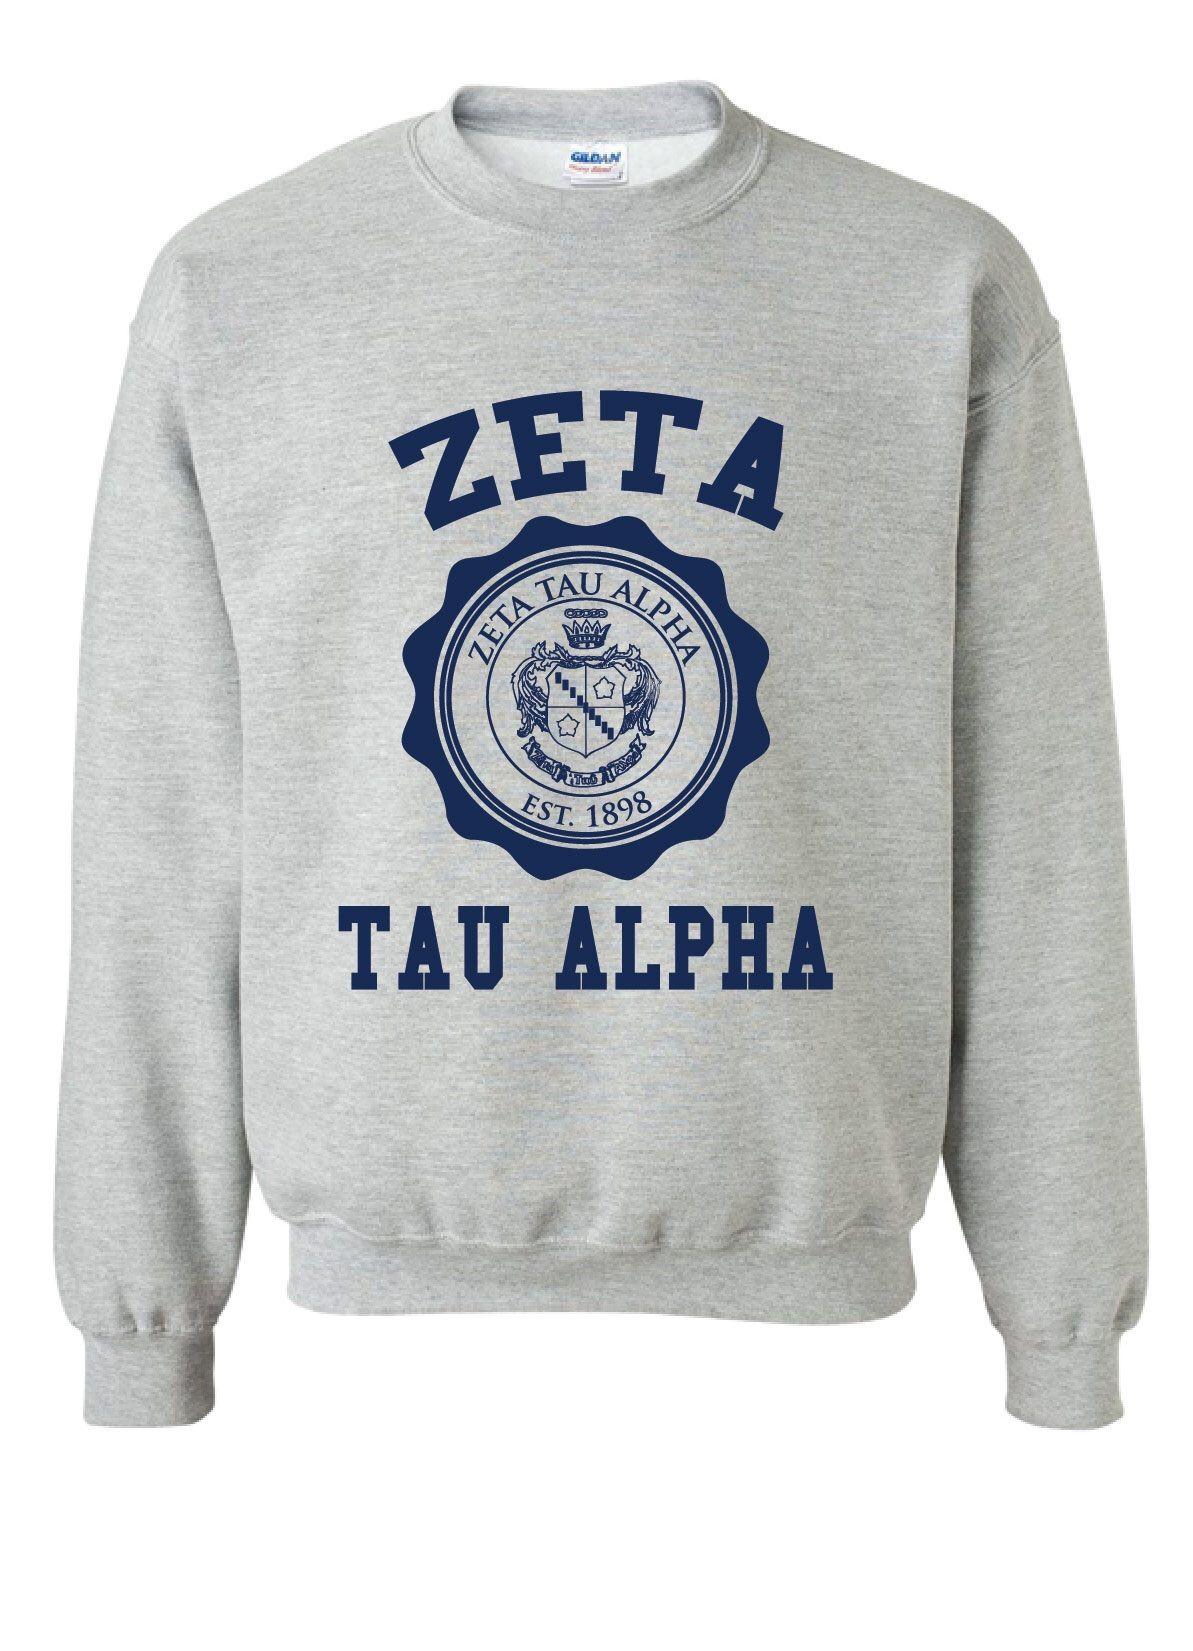 zta sweatshirt - Sweatshirt Design Ideas